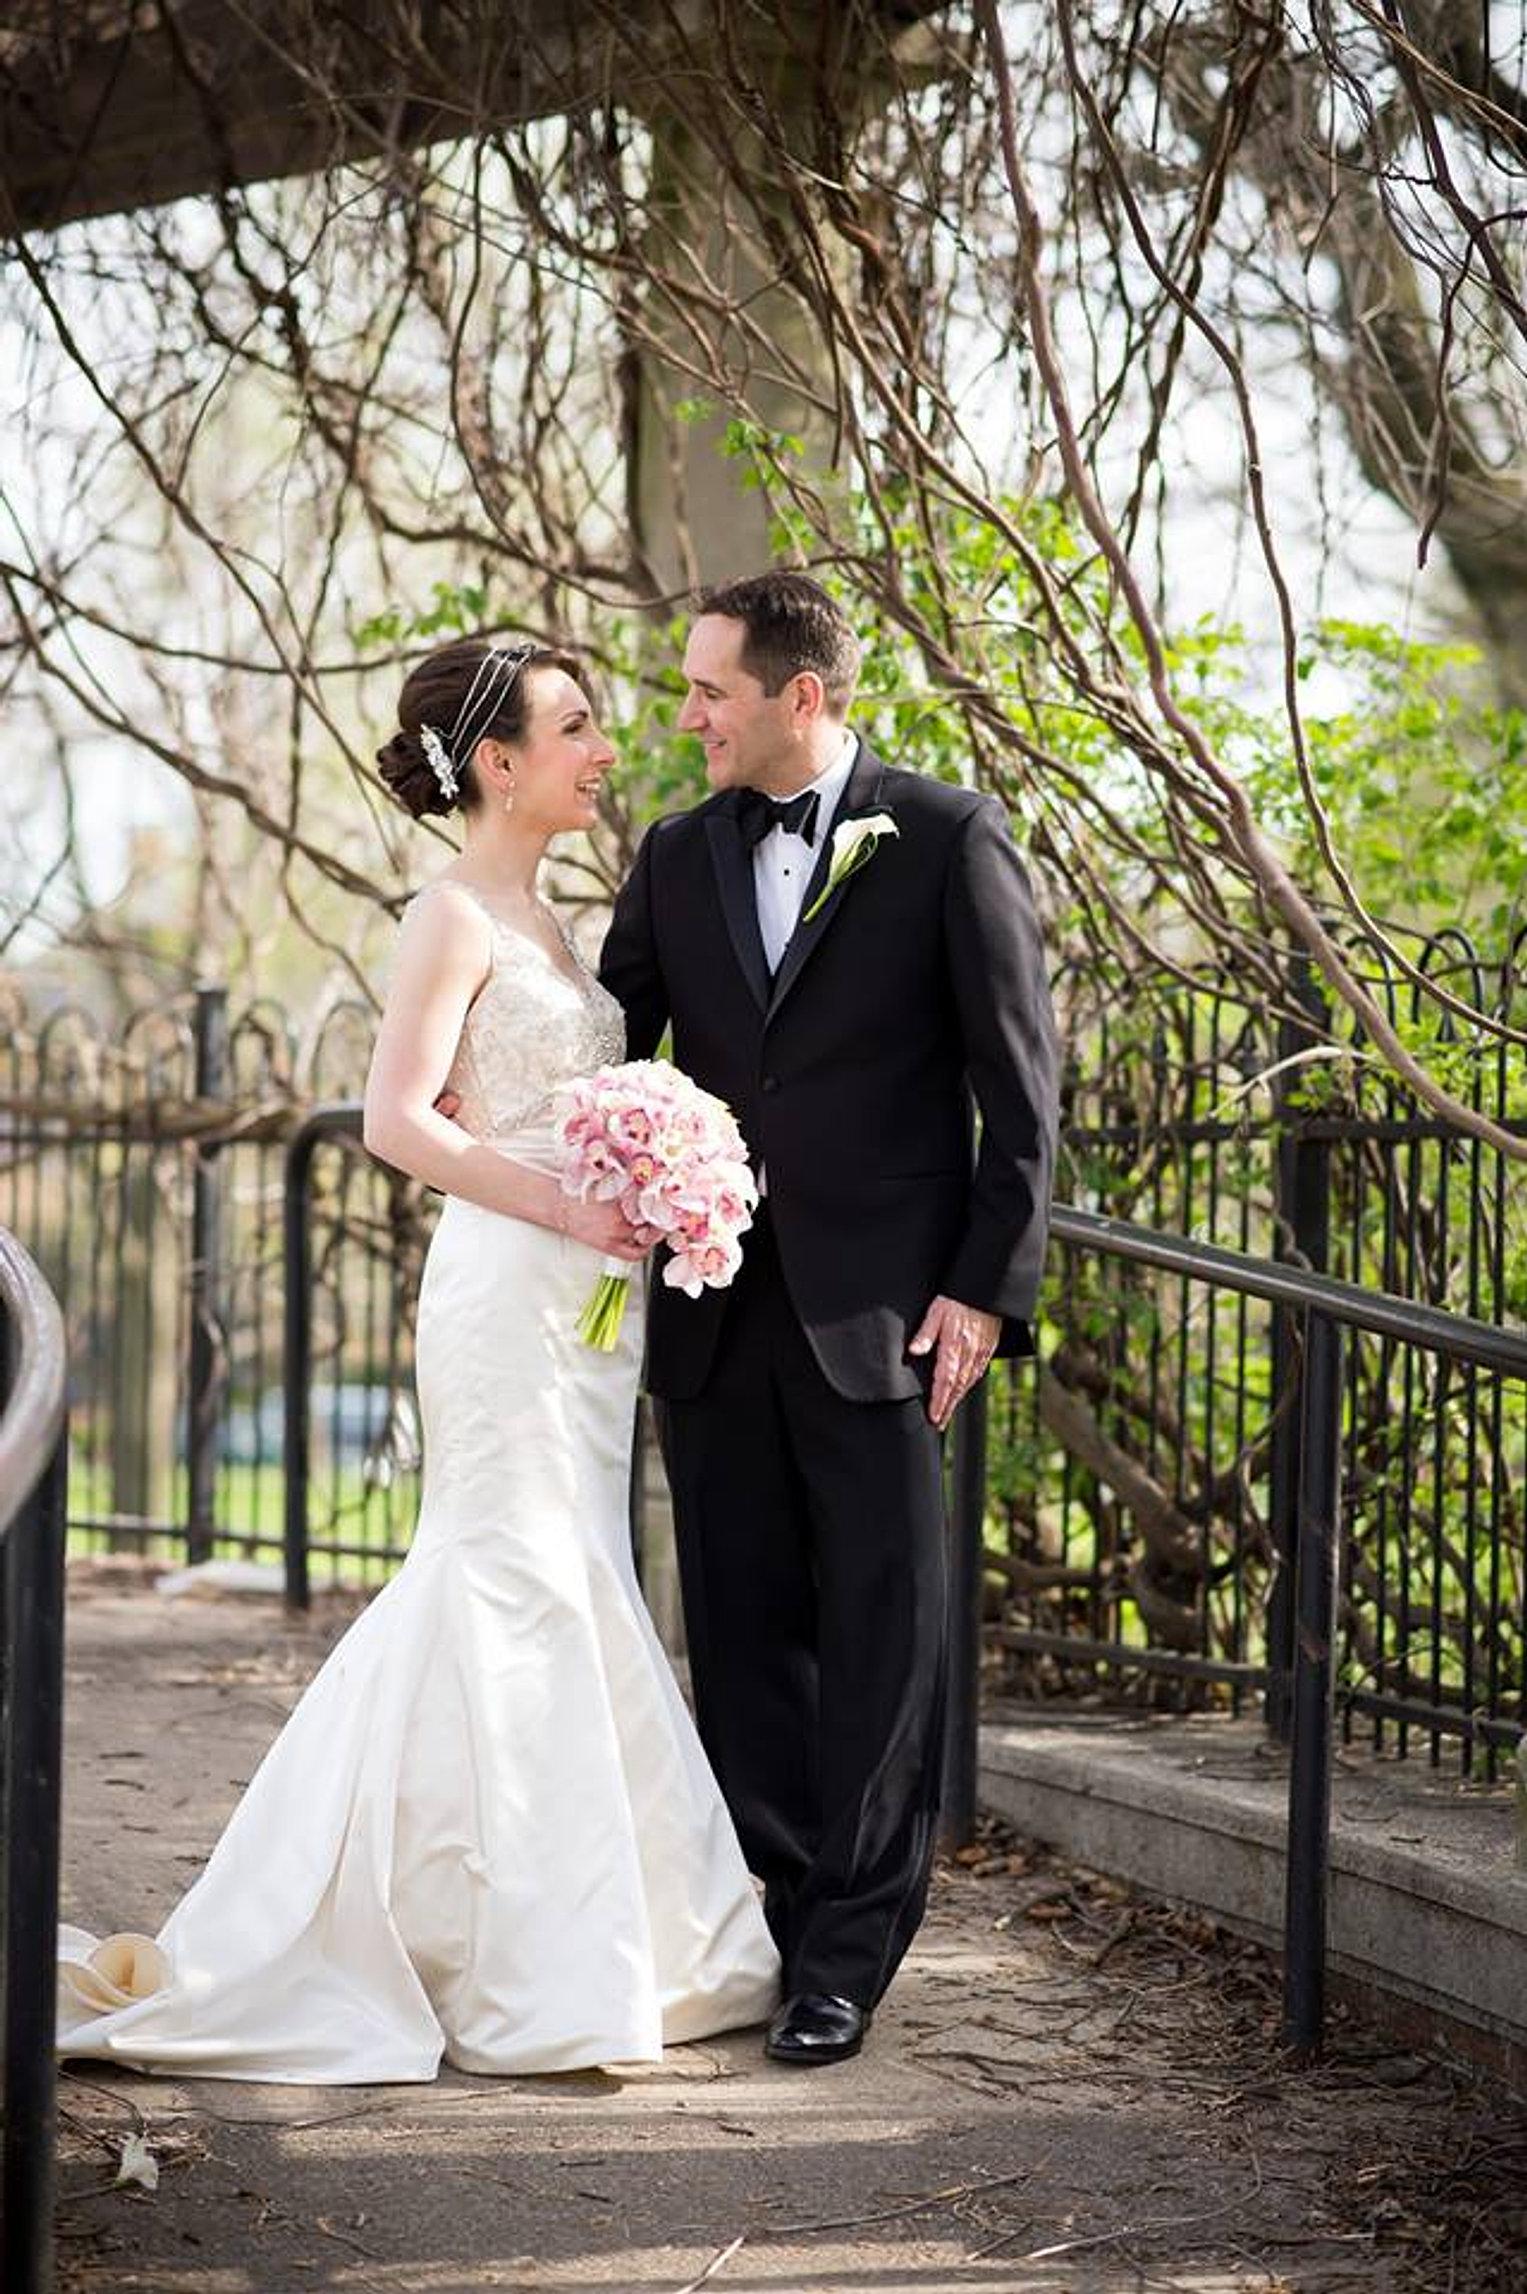 Shannon Goode, On-site hairstylist Columbus, Ohio Top Wedding Pro